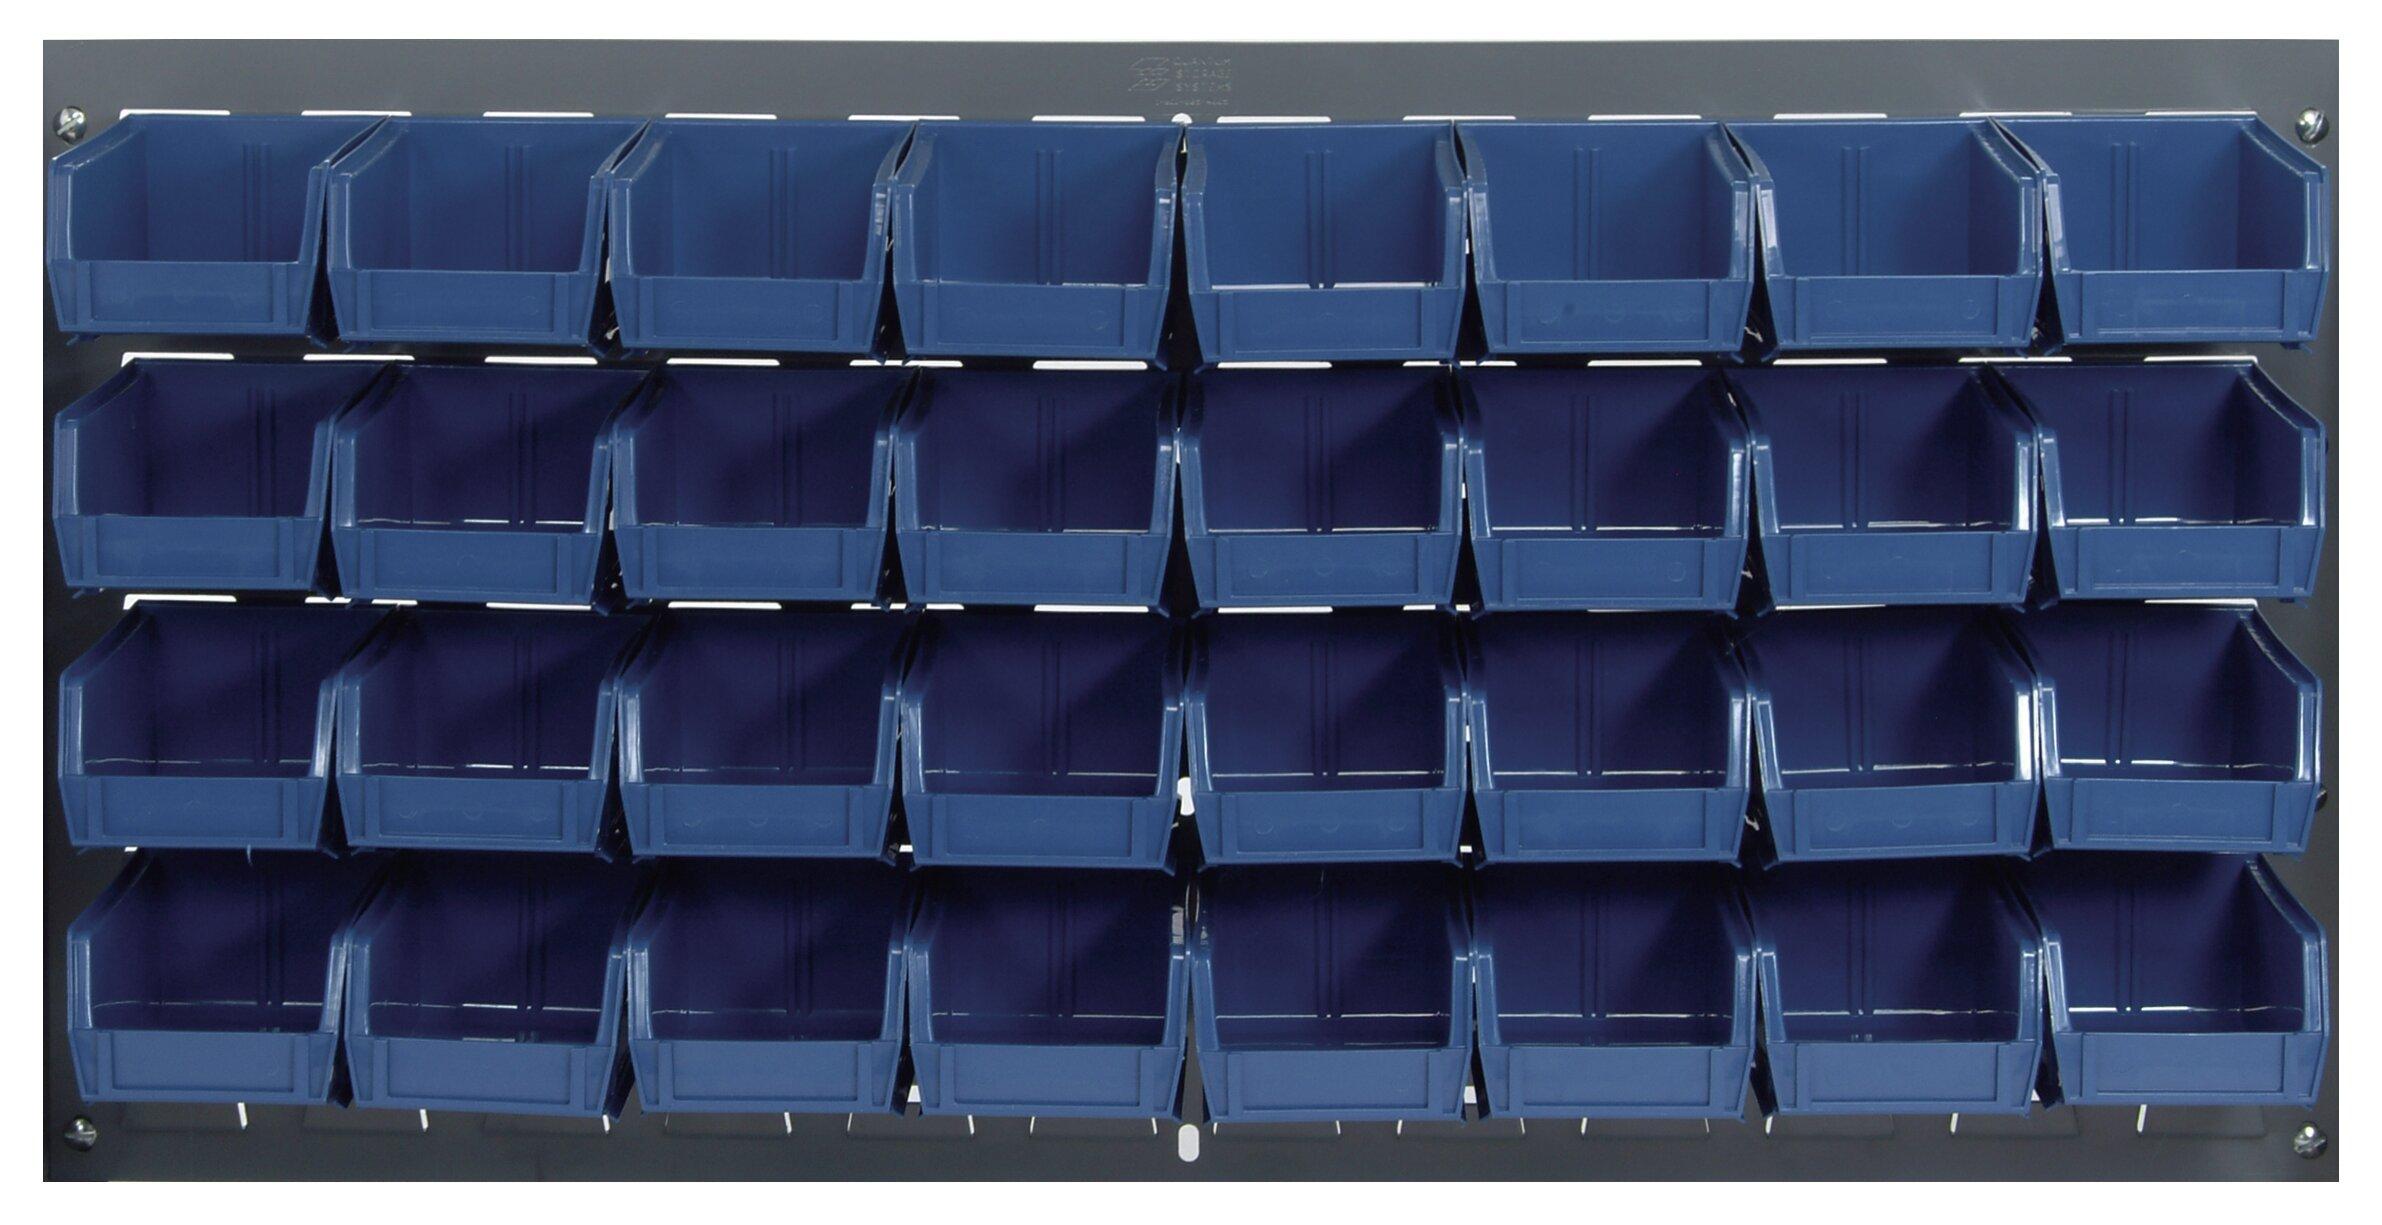 Versatile Heavy Duty Plastic Storage Parts Bins Boxes Louvre Panel Bin Kit 22